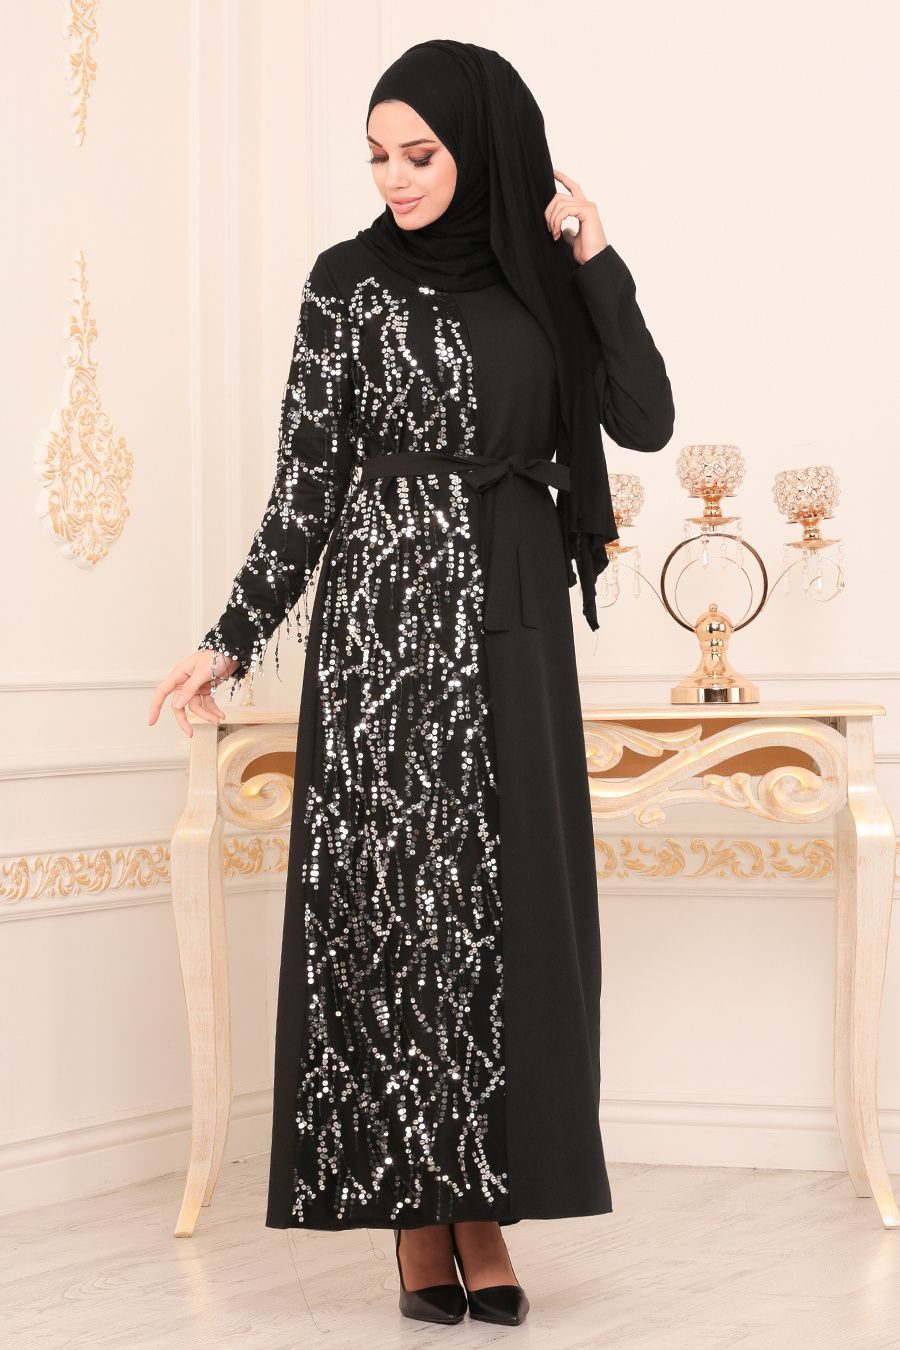 Nayla Collection Pul Payetli Siyah Tesettur Elbise 6248s Tesetturisland Com The Dress Elbise Abaya Modasi